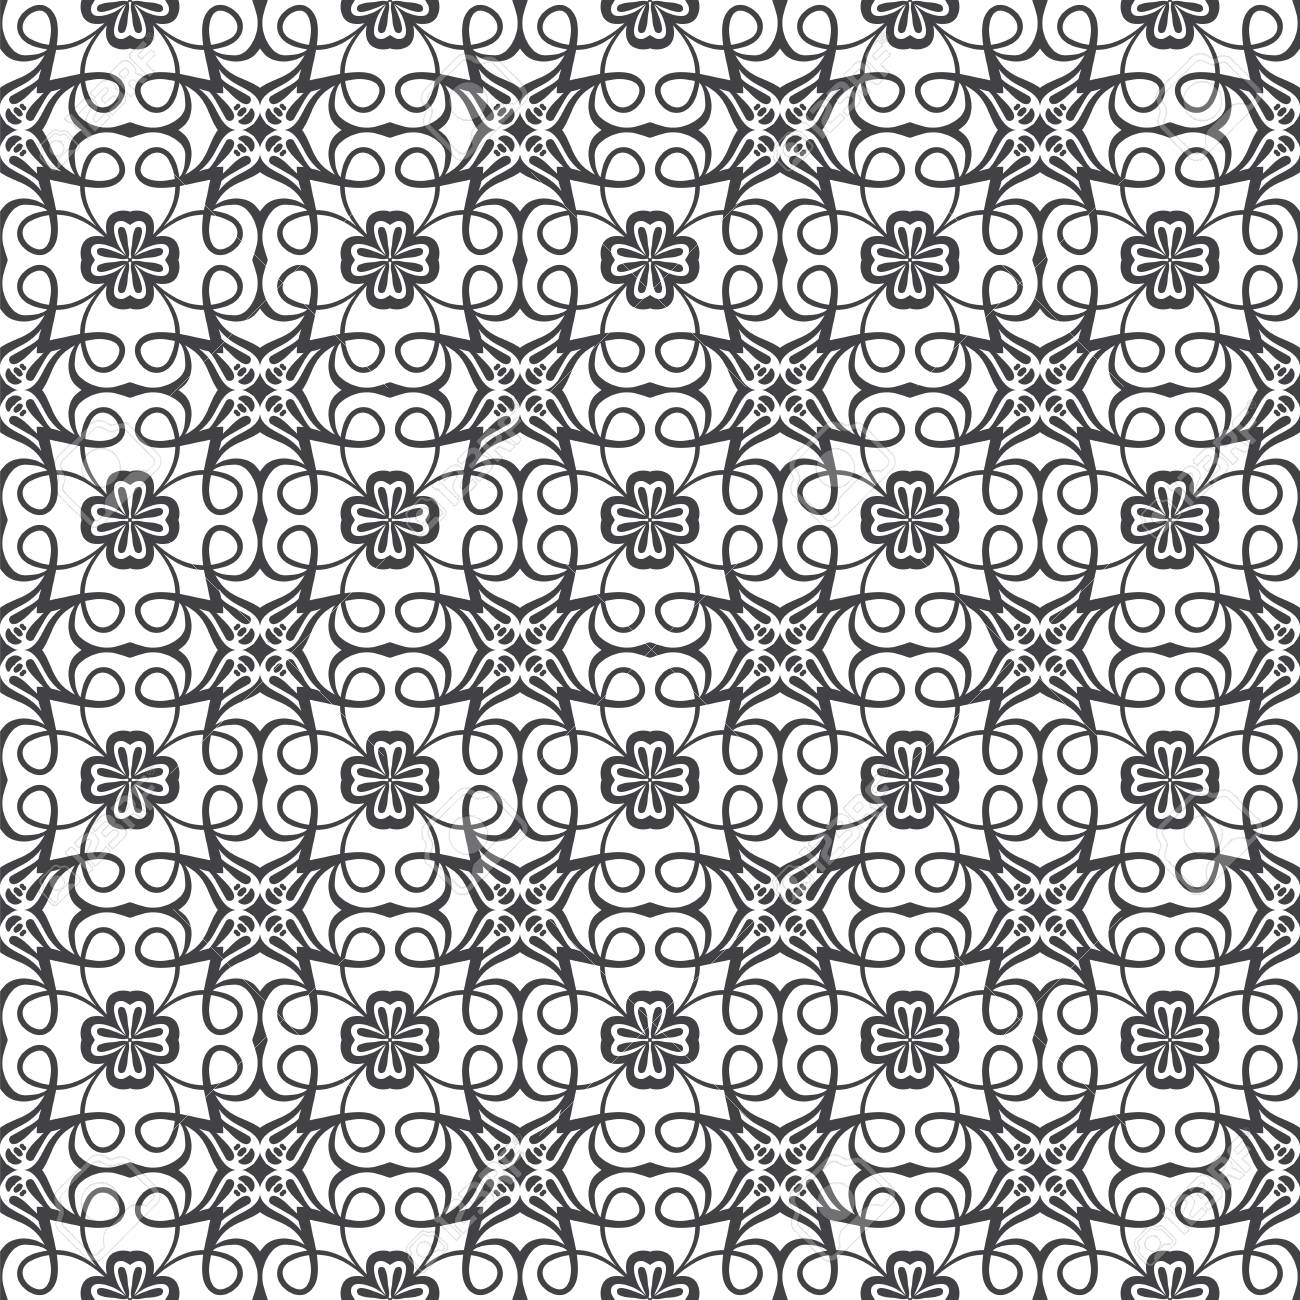 Seamless Damask pattern. | Vector illustration. Stock Photo - 9534761